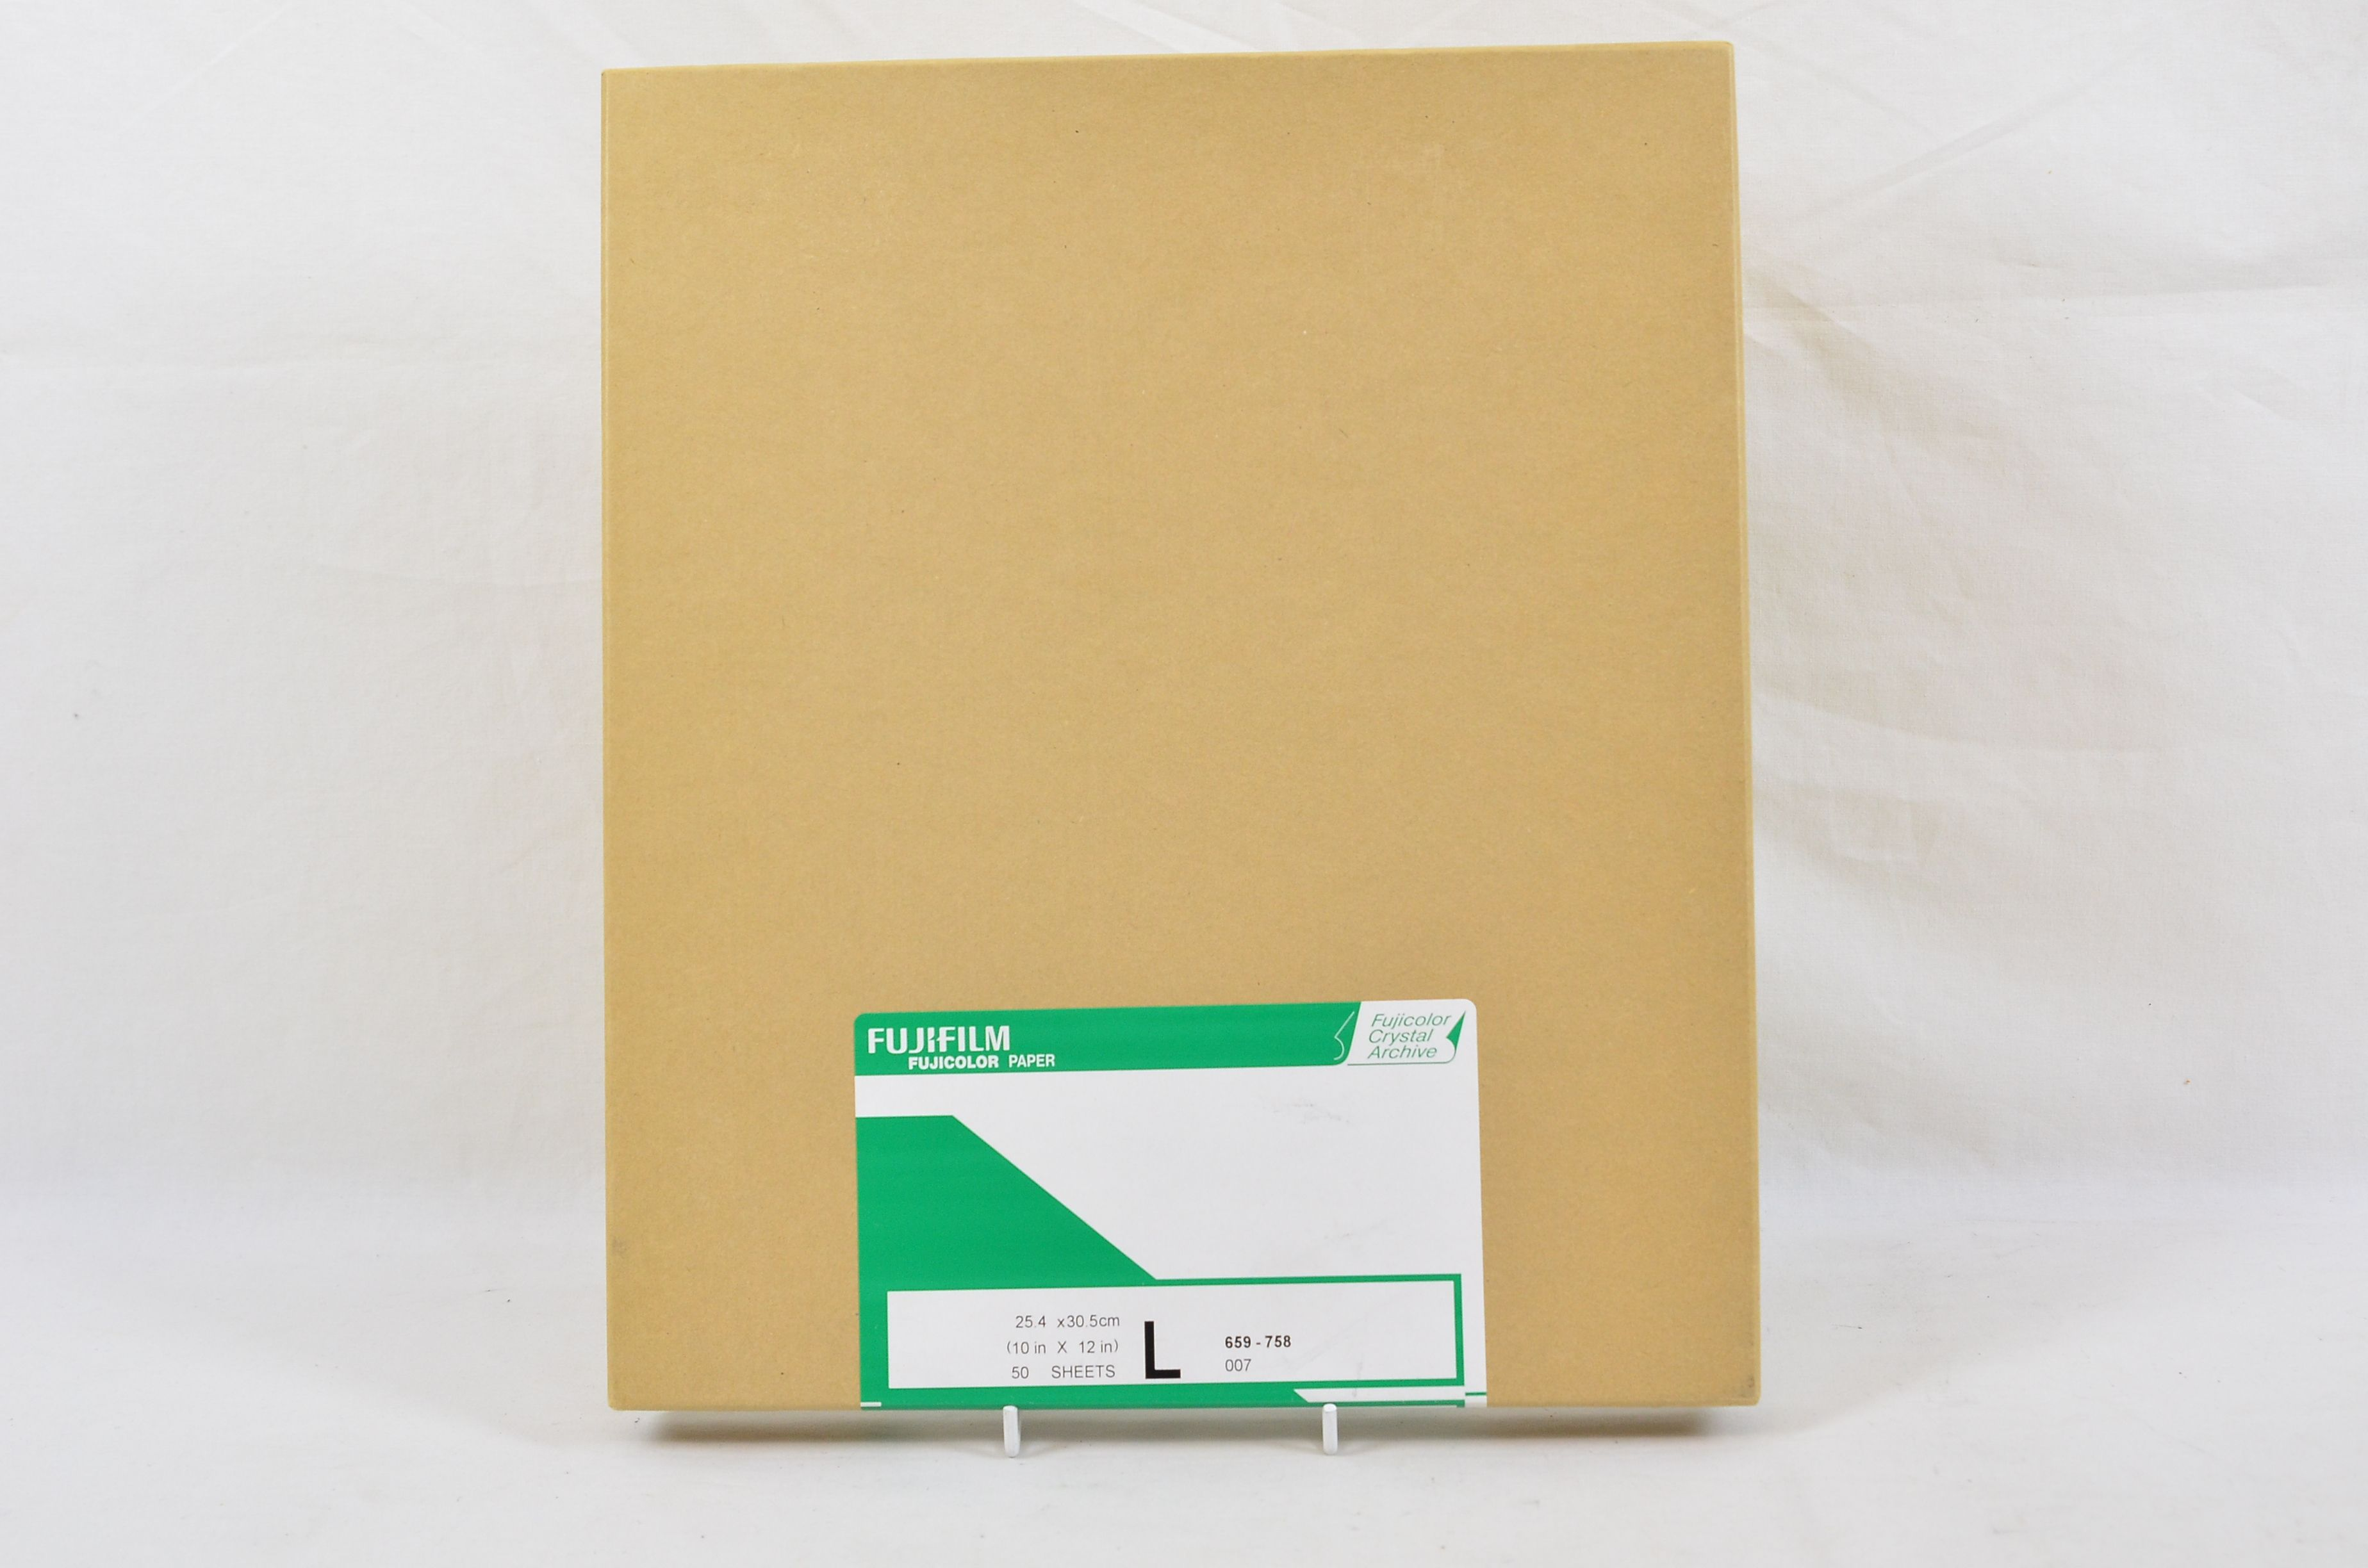 Fujifilm Fujicolor Crystal Archive Lustre Paper 25.4x30.5cm 10x12in - 50 Sheets 1